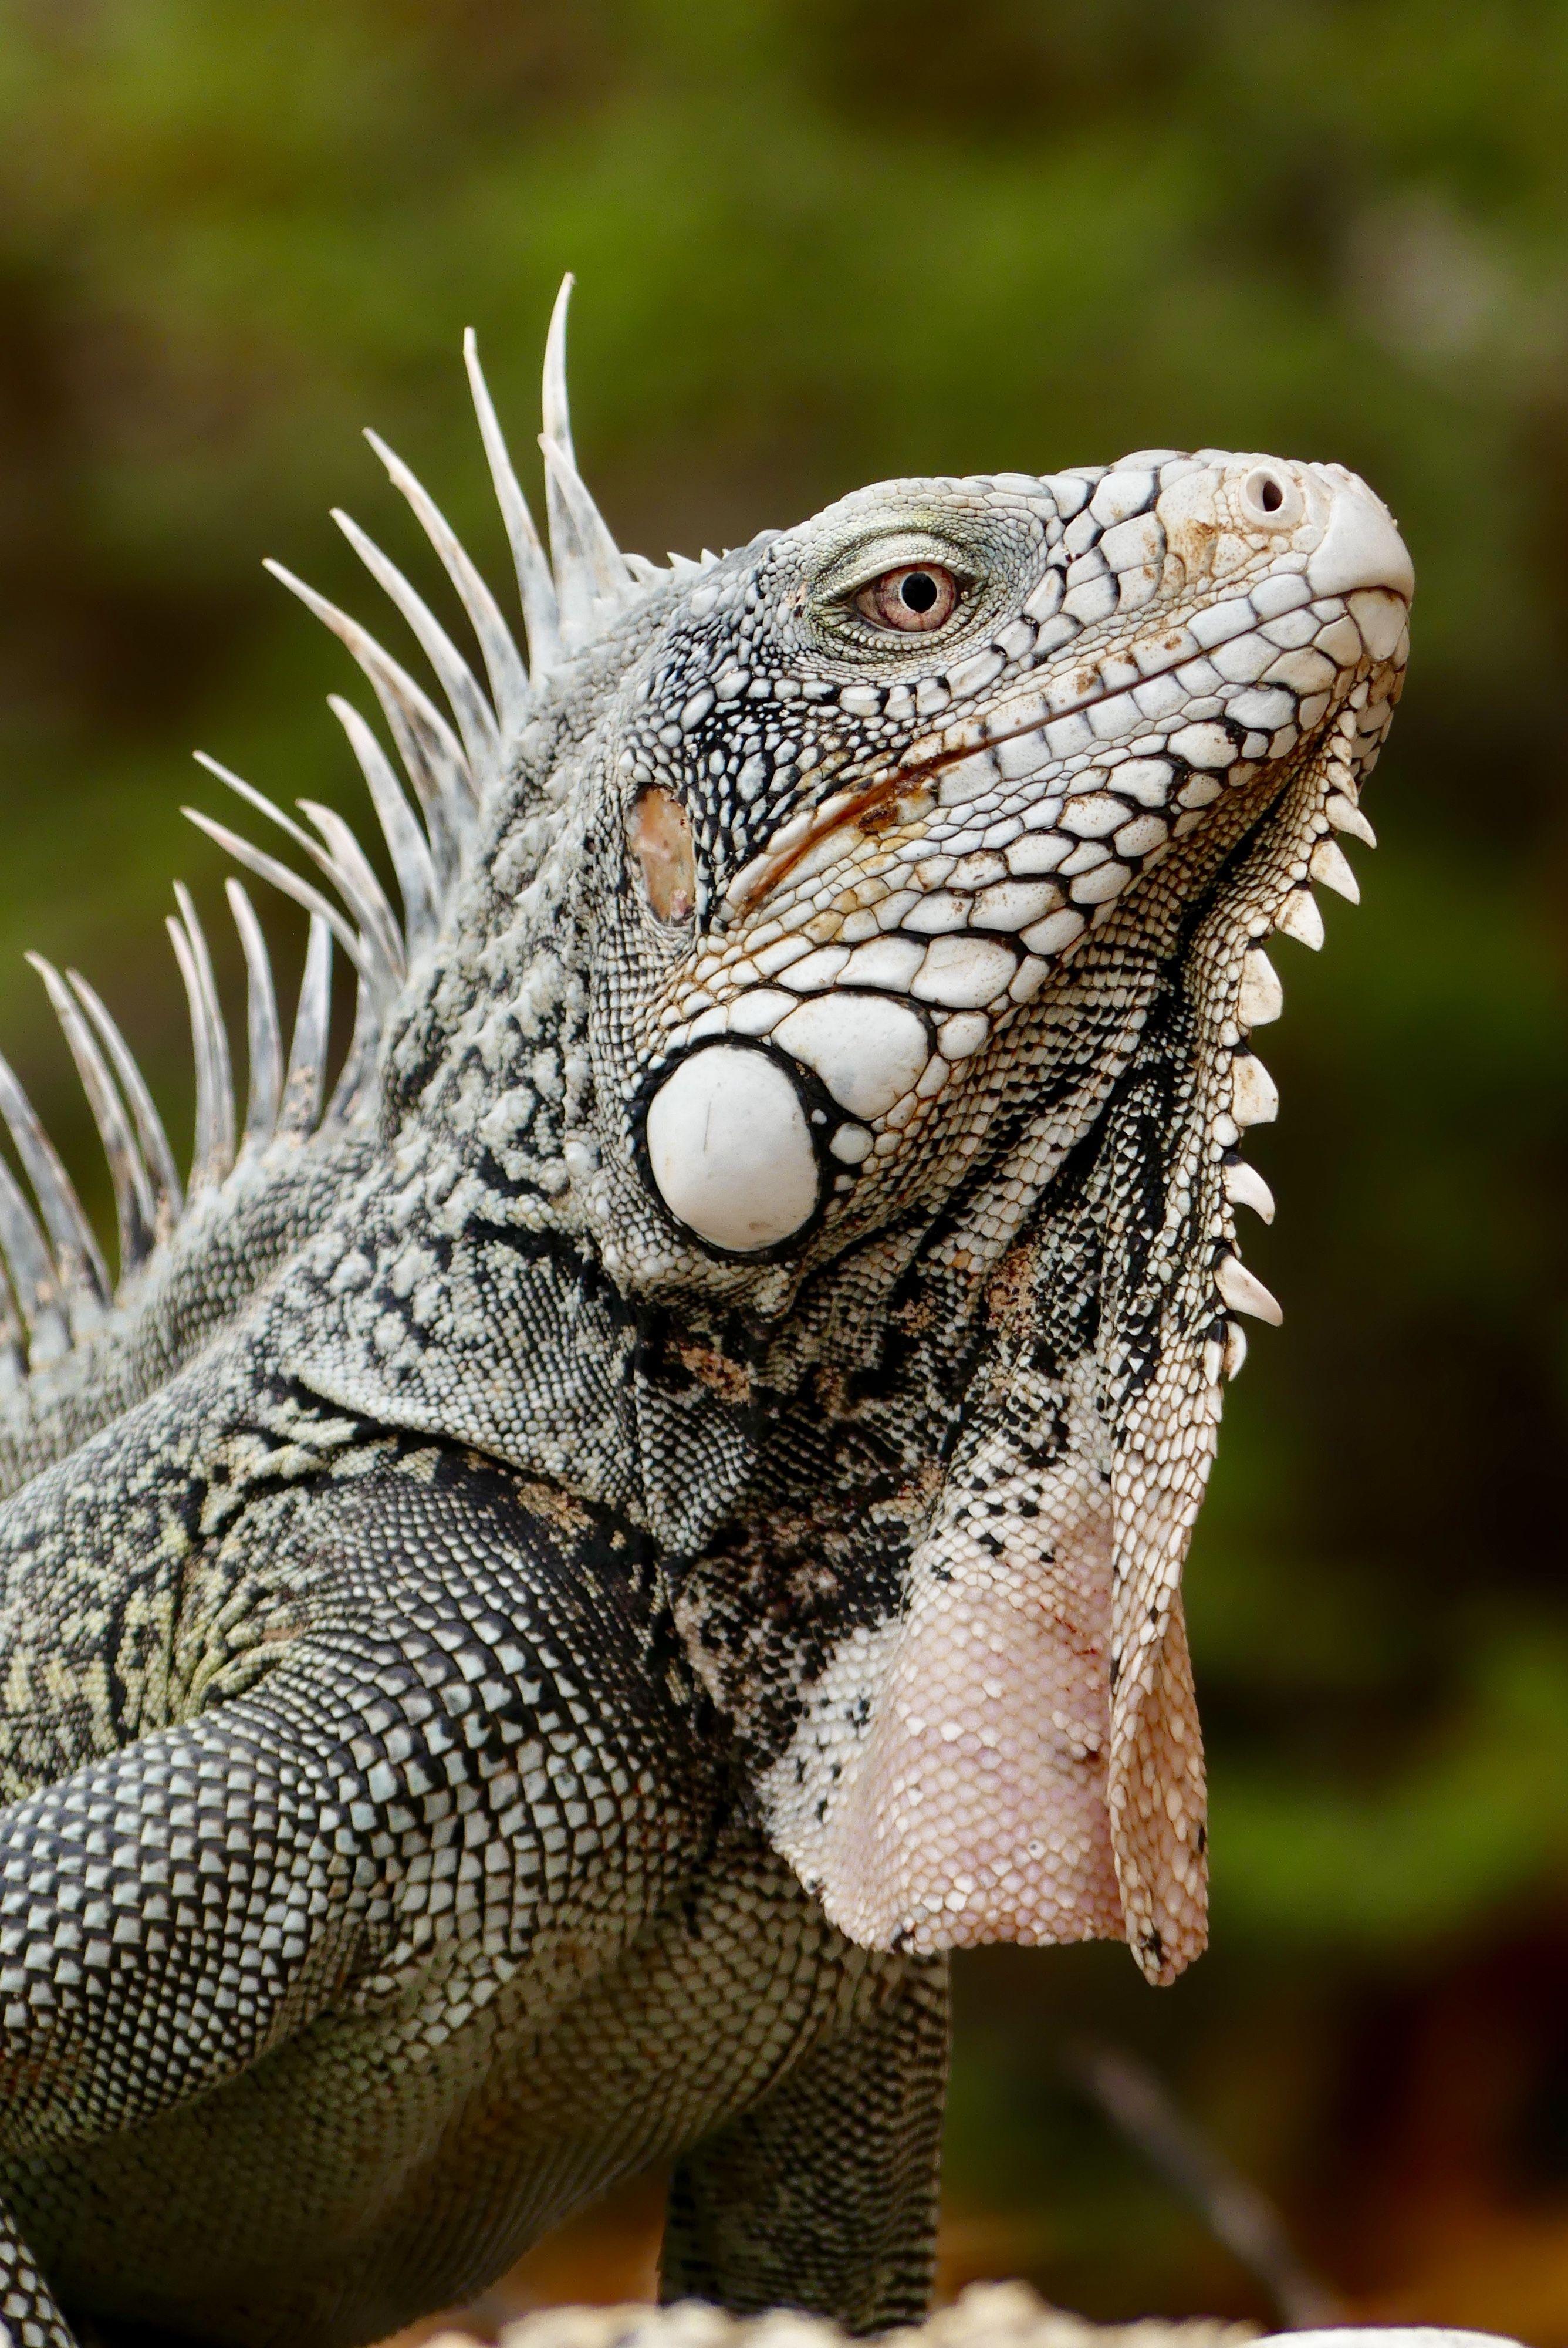 Curacao Leguaan Amphibians Reptiles And Amphibians Animals